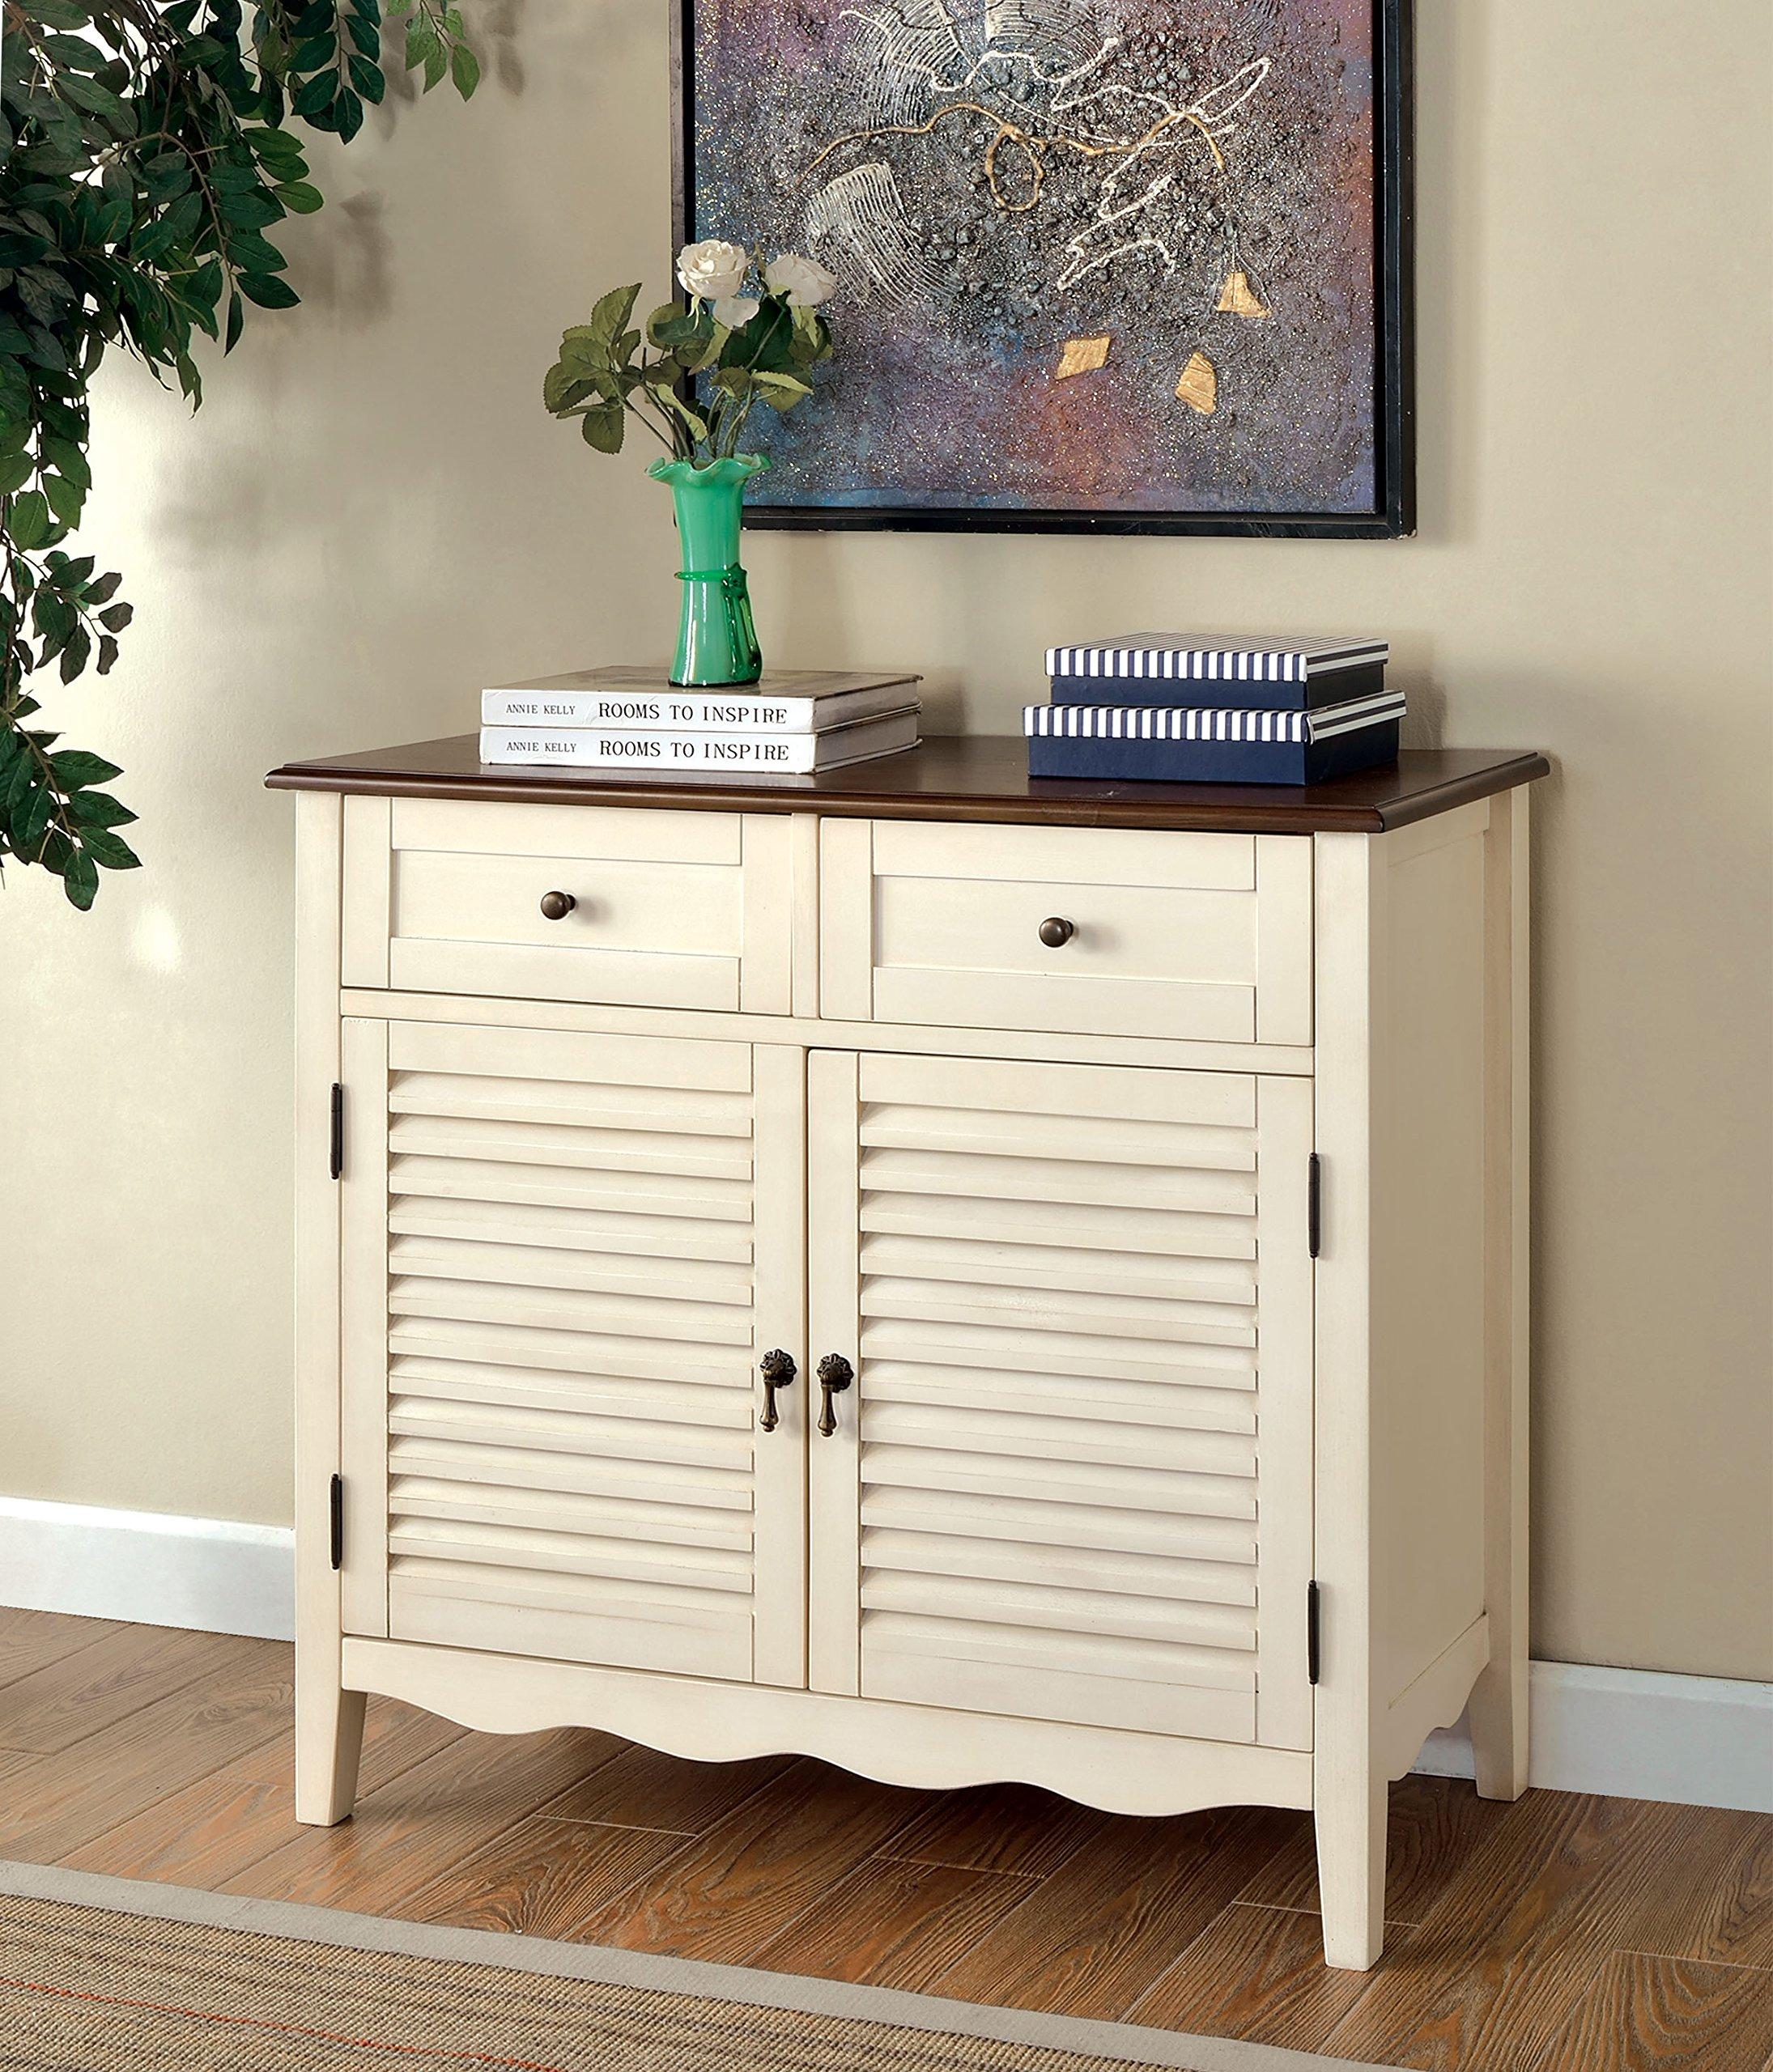 Furniture of America Mallia Country Louver Storage Cabinet, White by Furniture of America